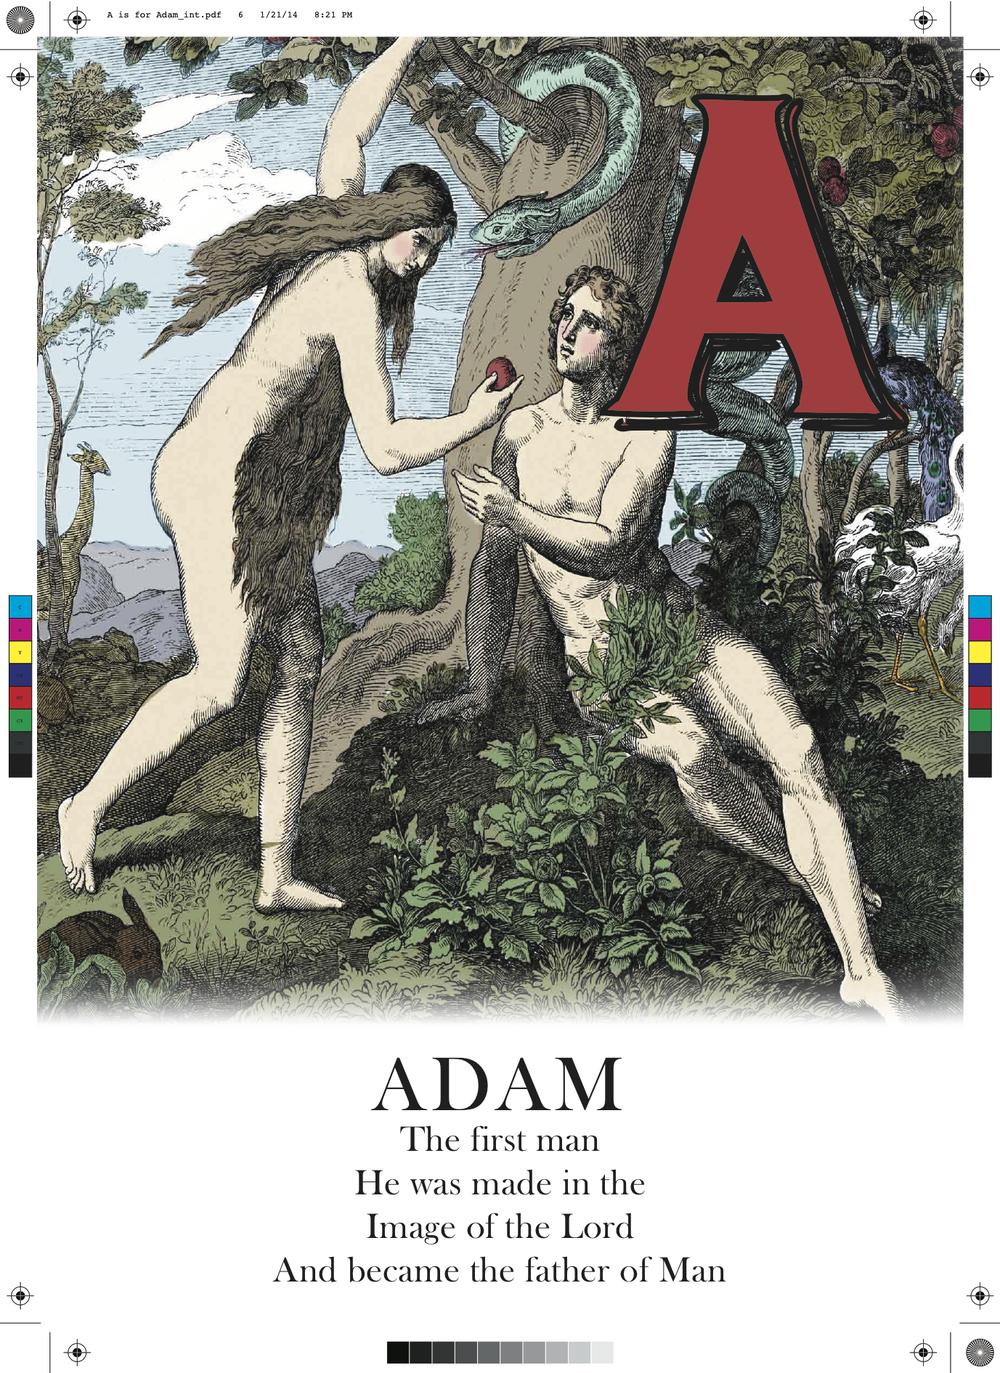 A for Adam exc 3.jpg